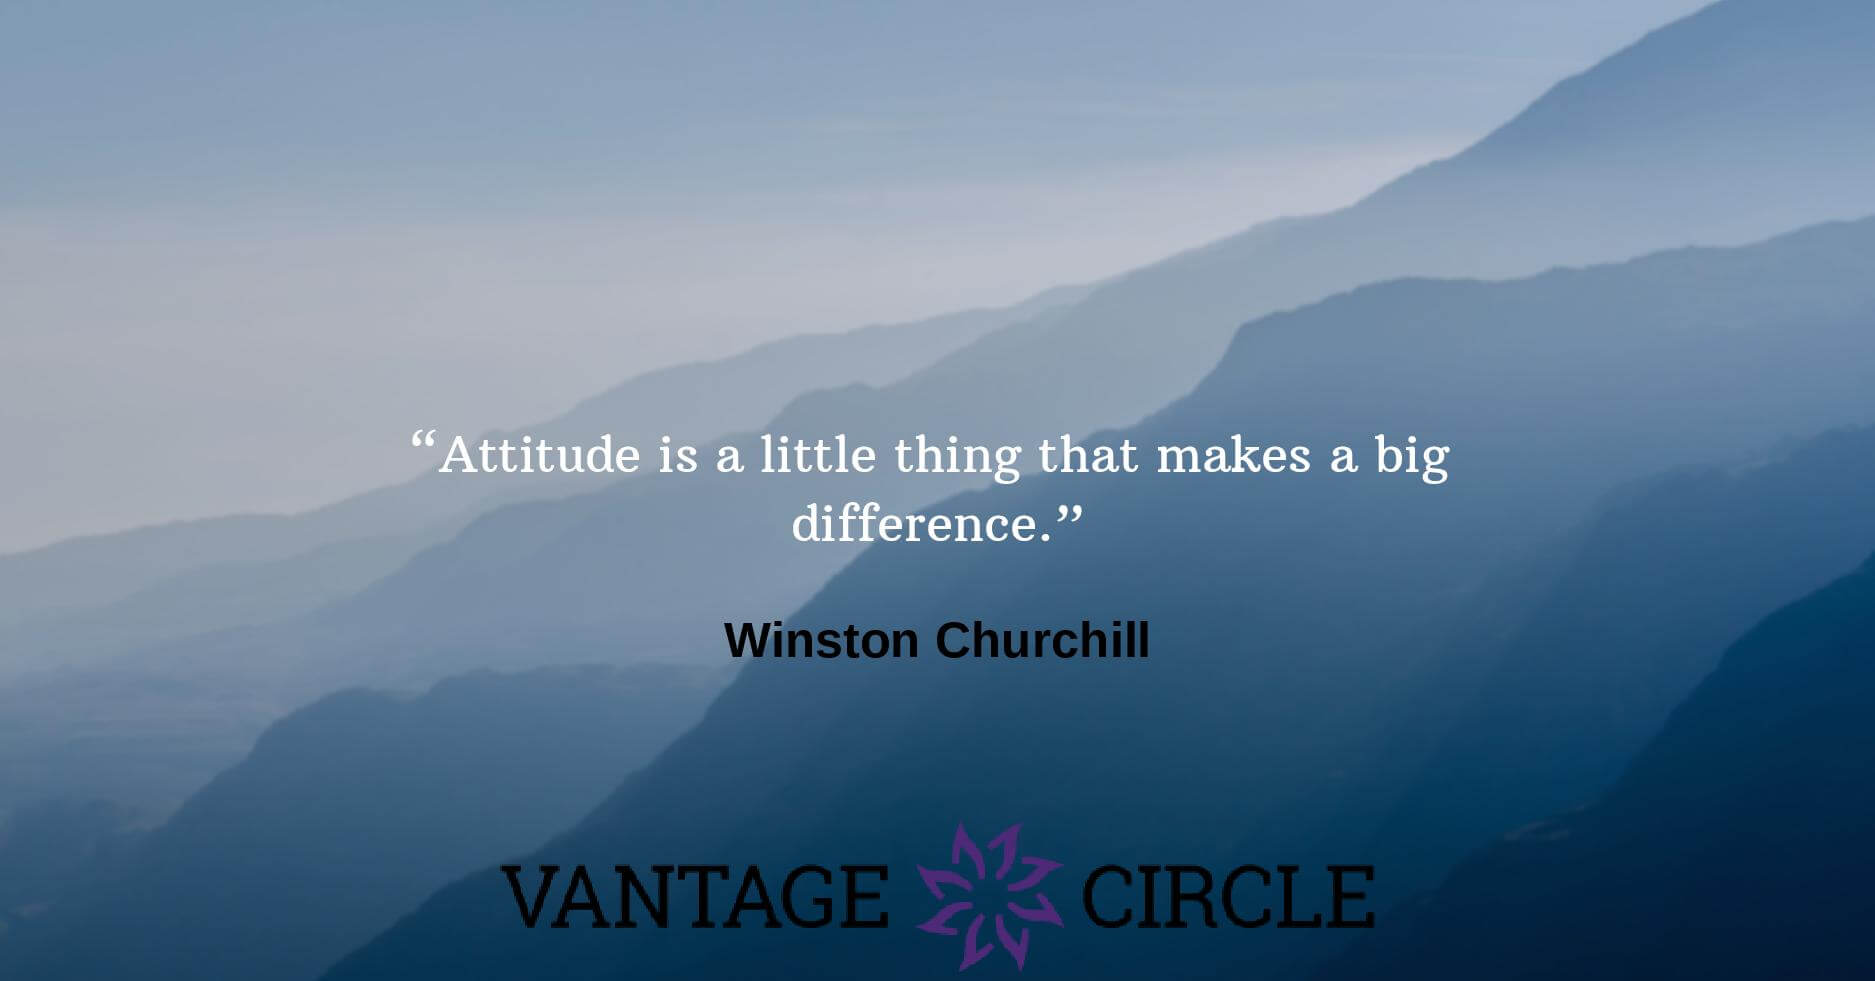 Employee-motivational-quotes-Winston-Churchill